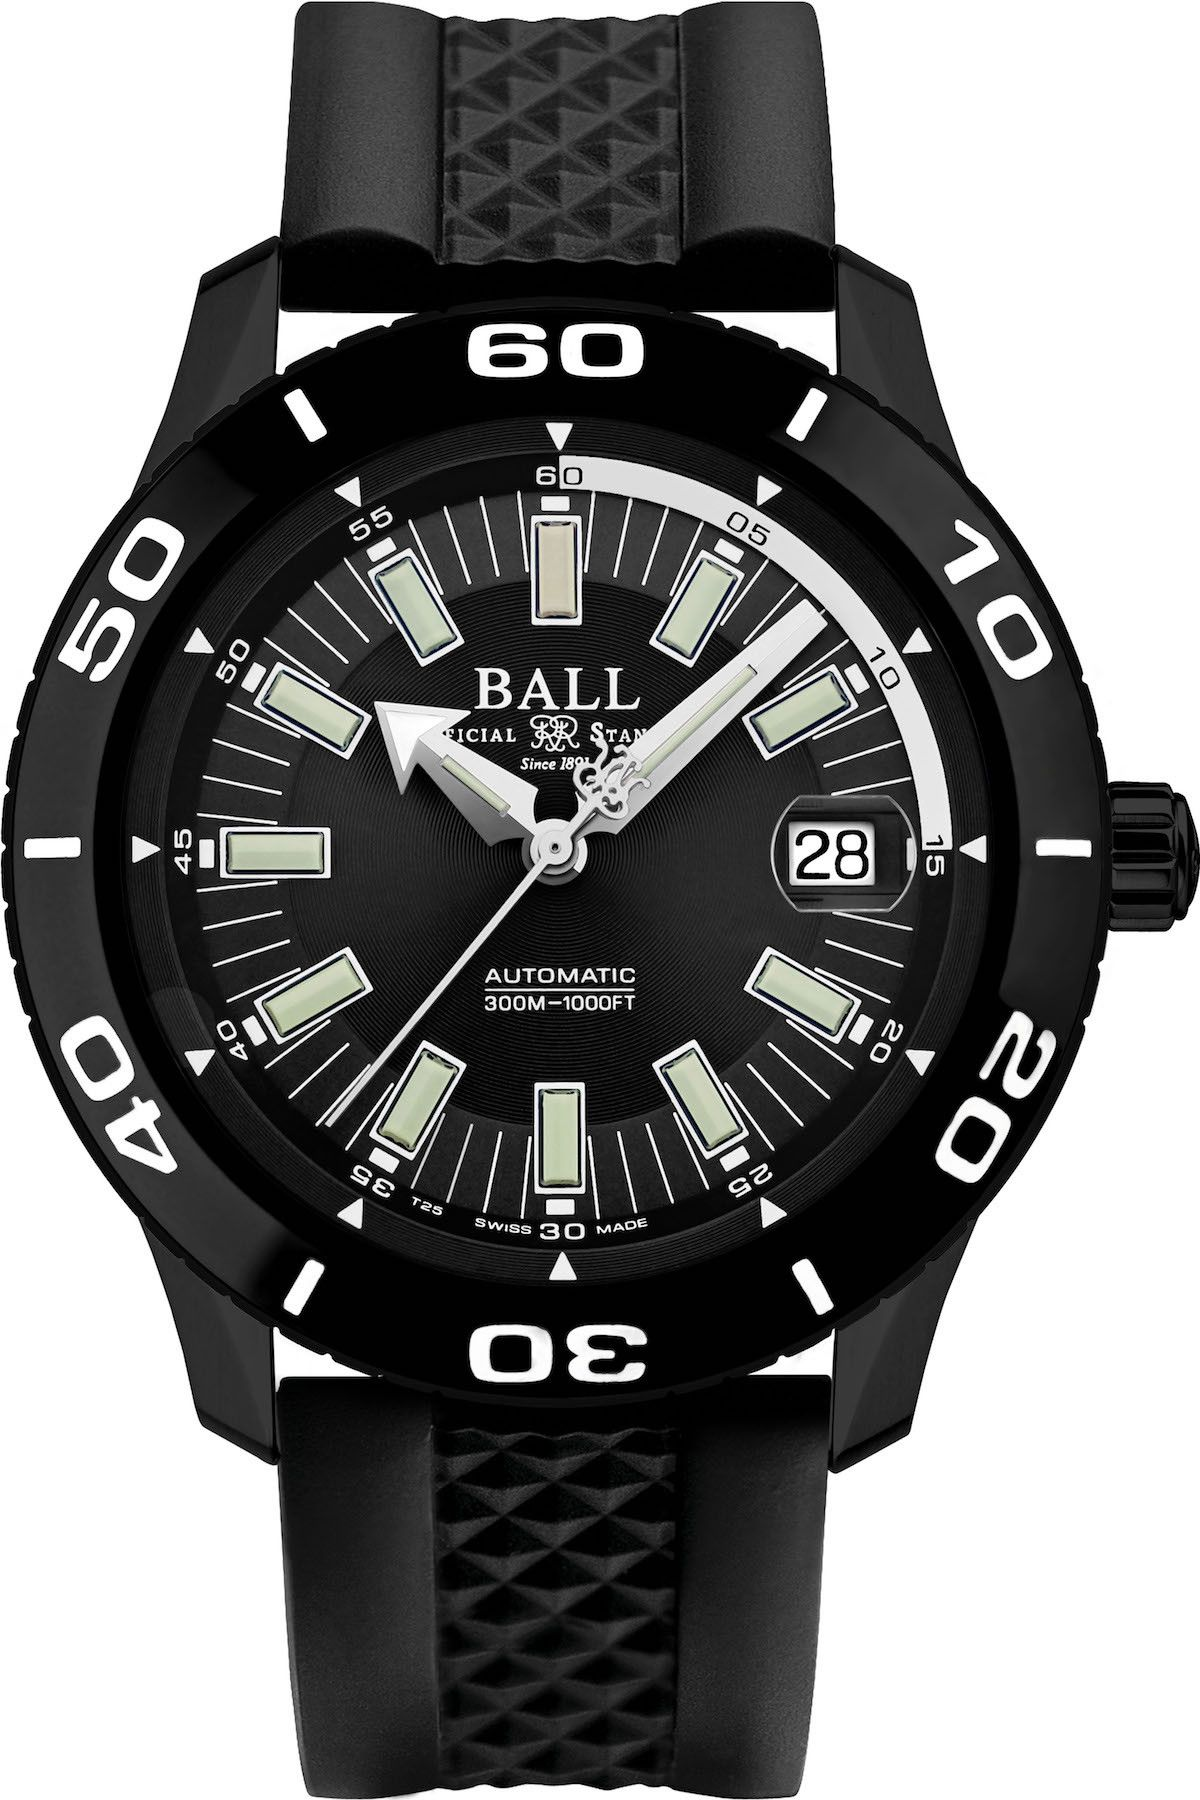 Ball Watch Company Fireman NECC Pre-Order